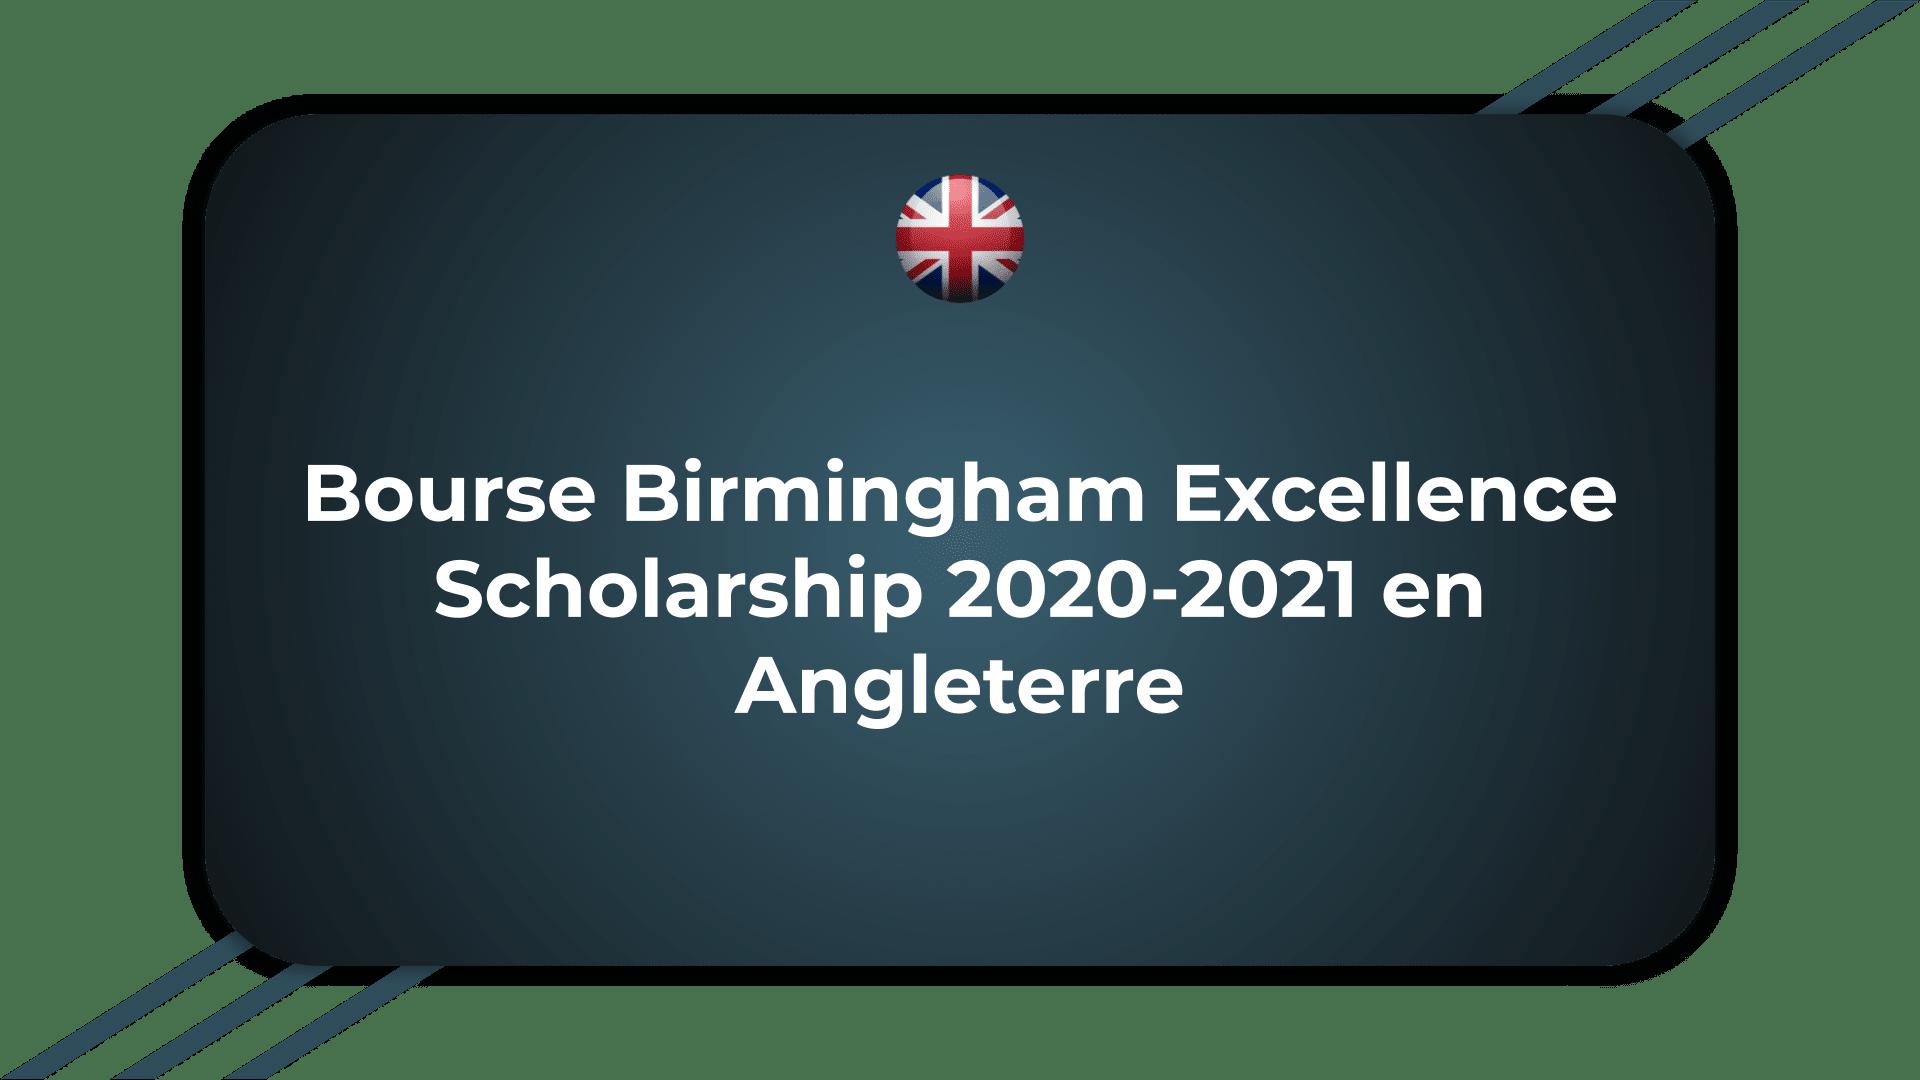 Bourse Birmingham Excellence Scholarship